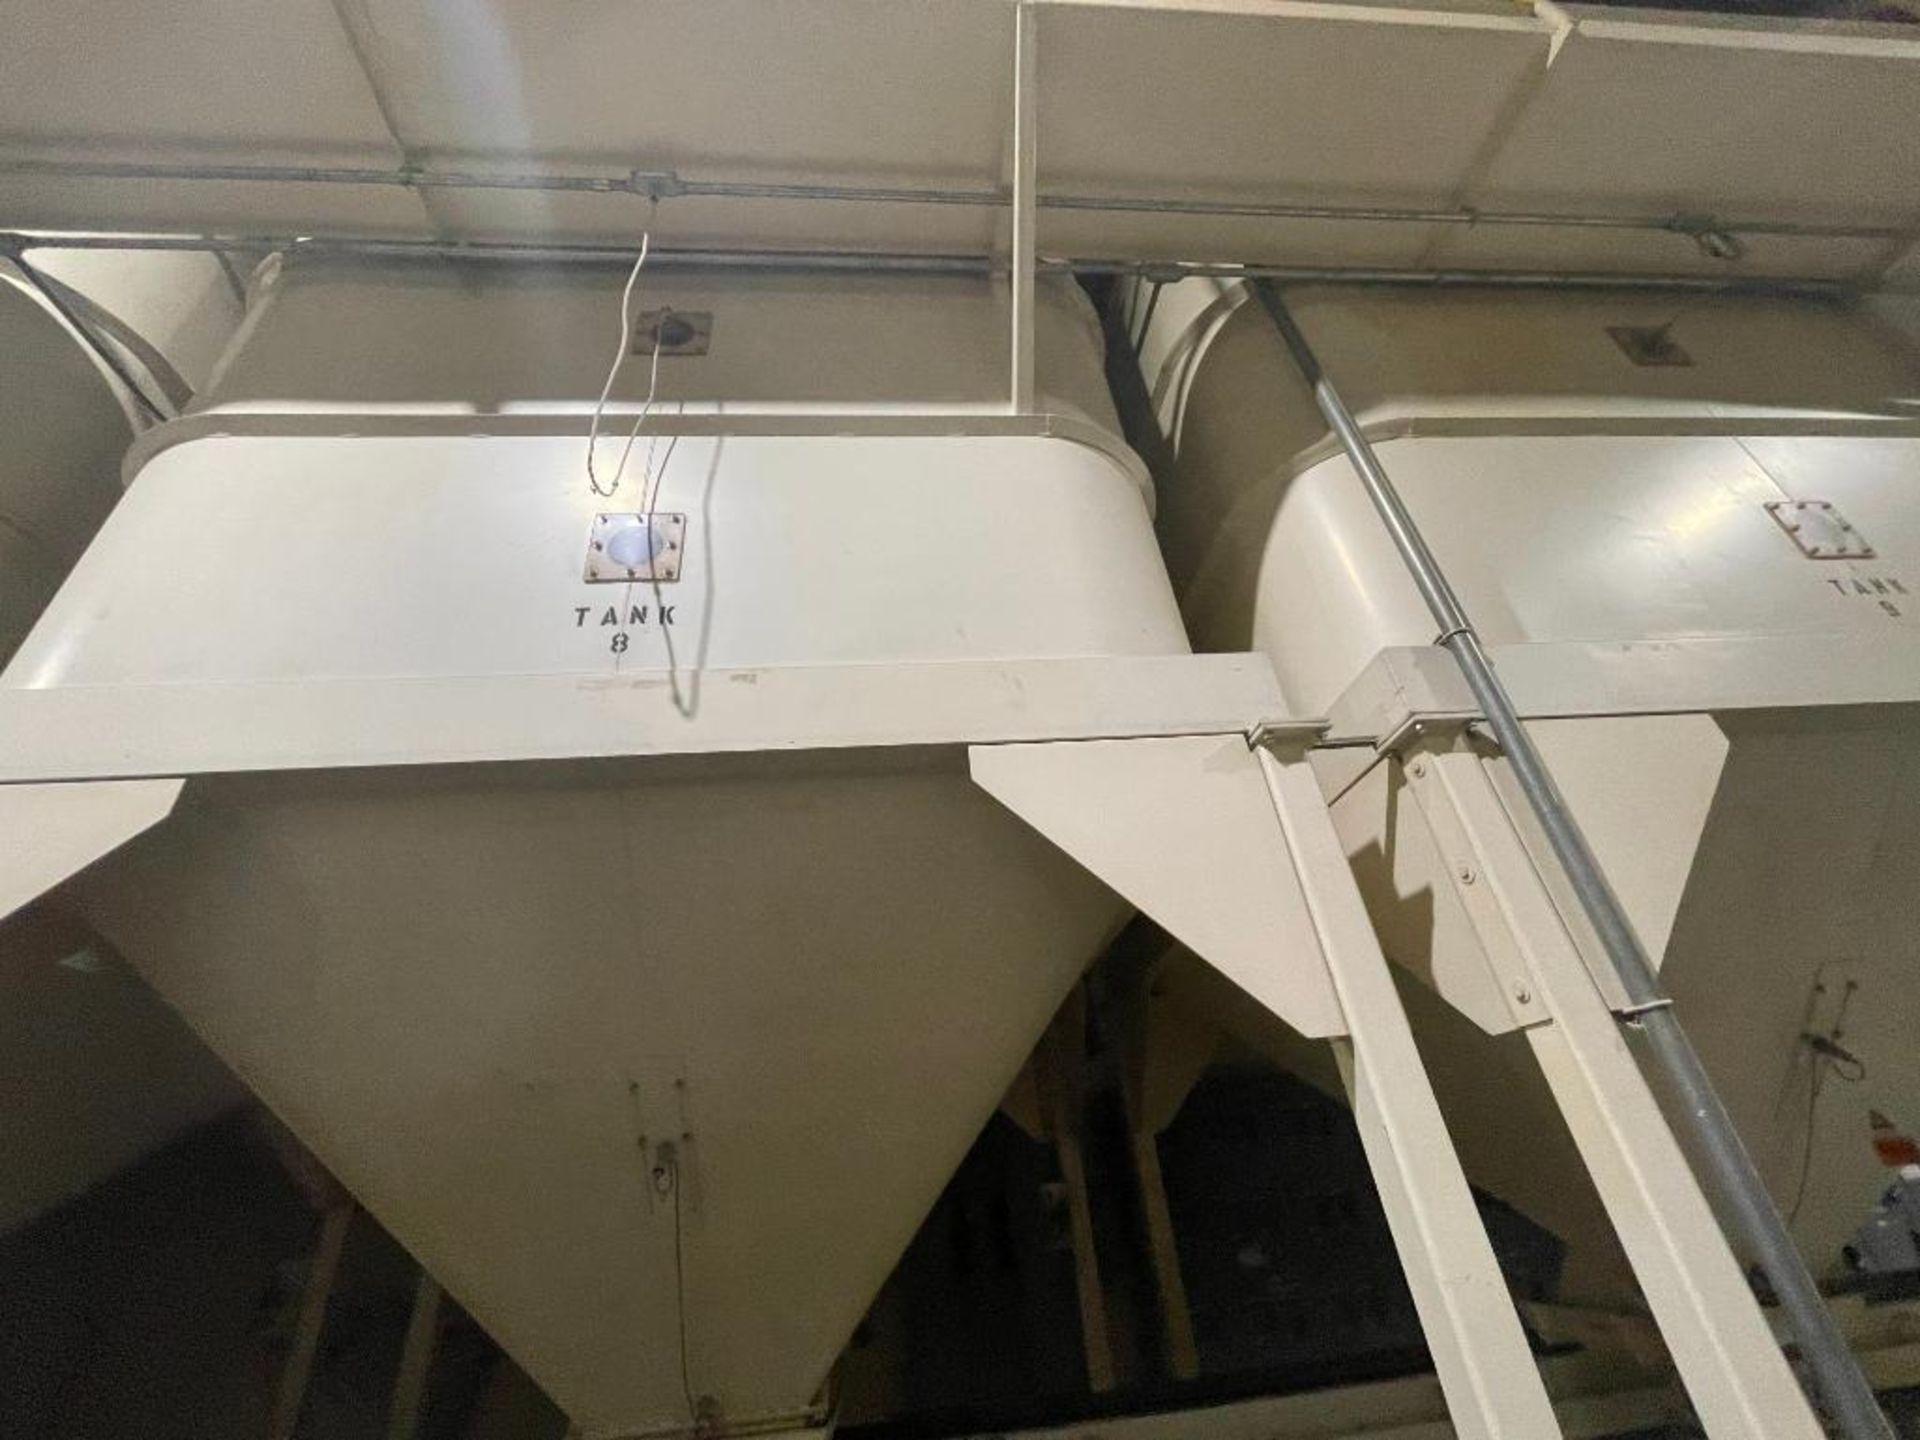 Aseeco mild steel cone bottom bulk storage bin - Image 11 of 28